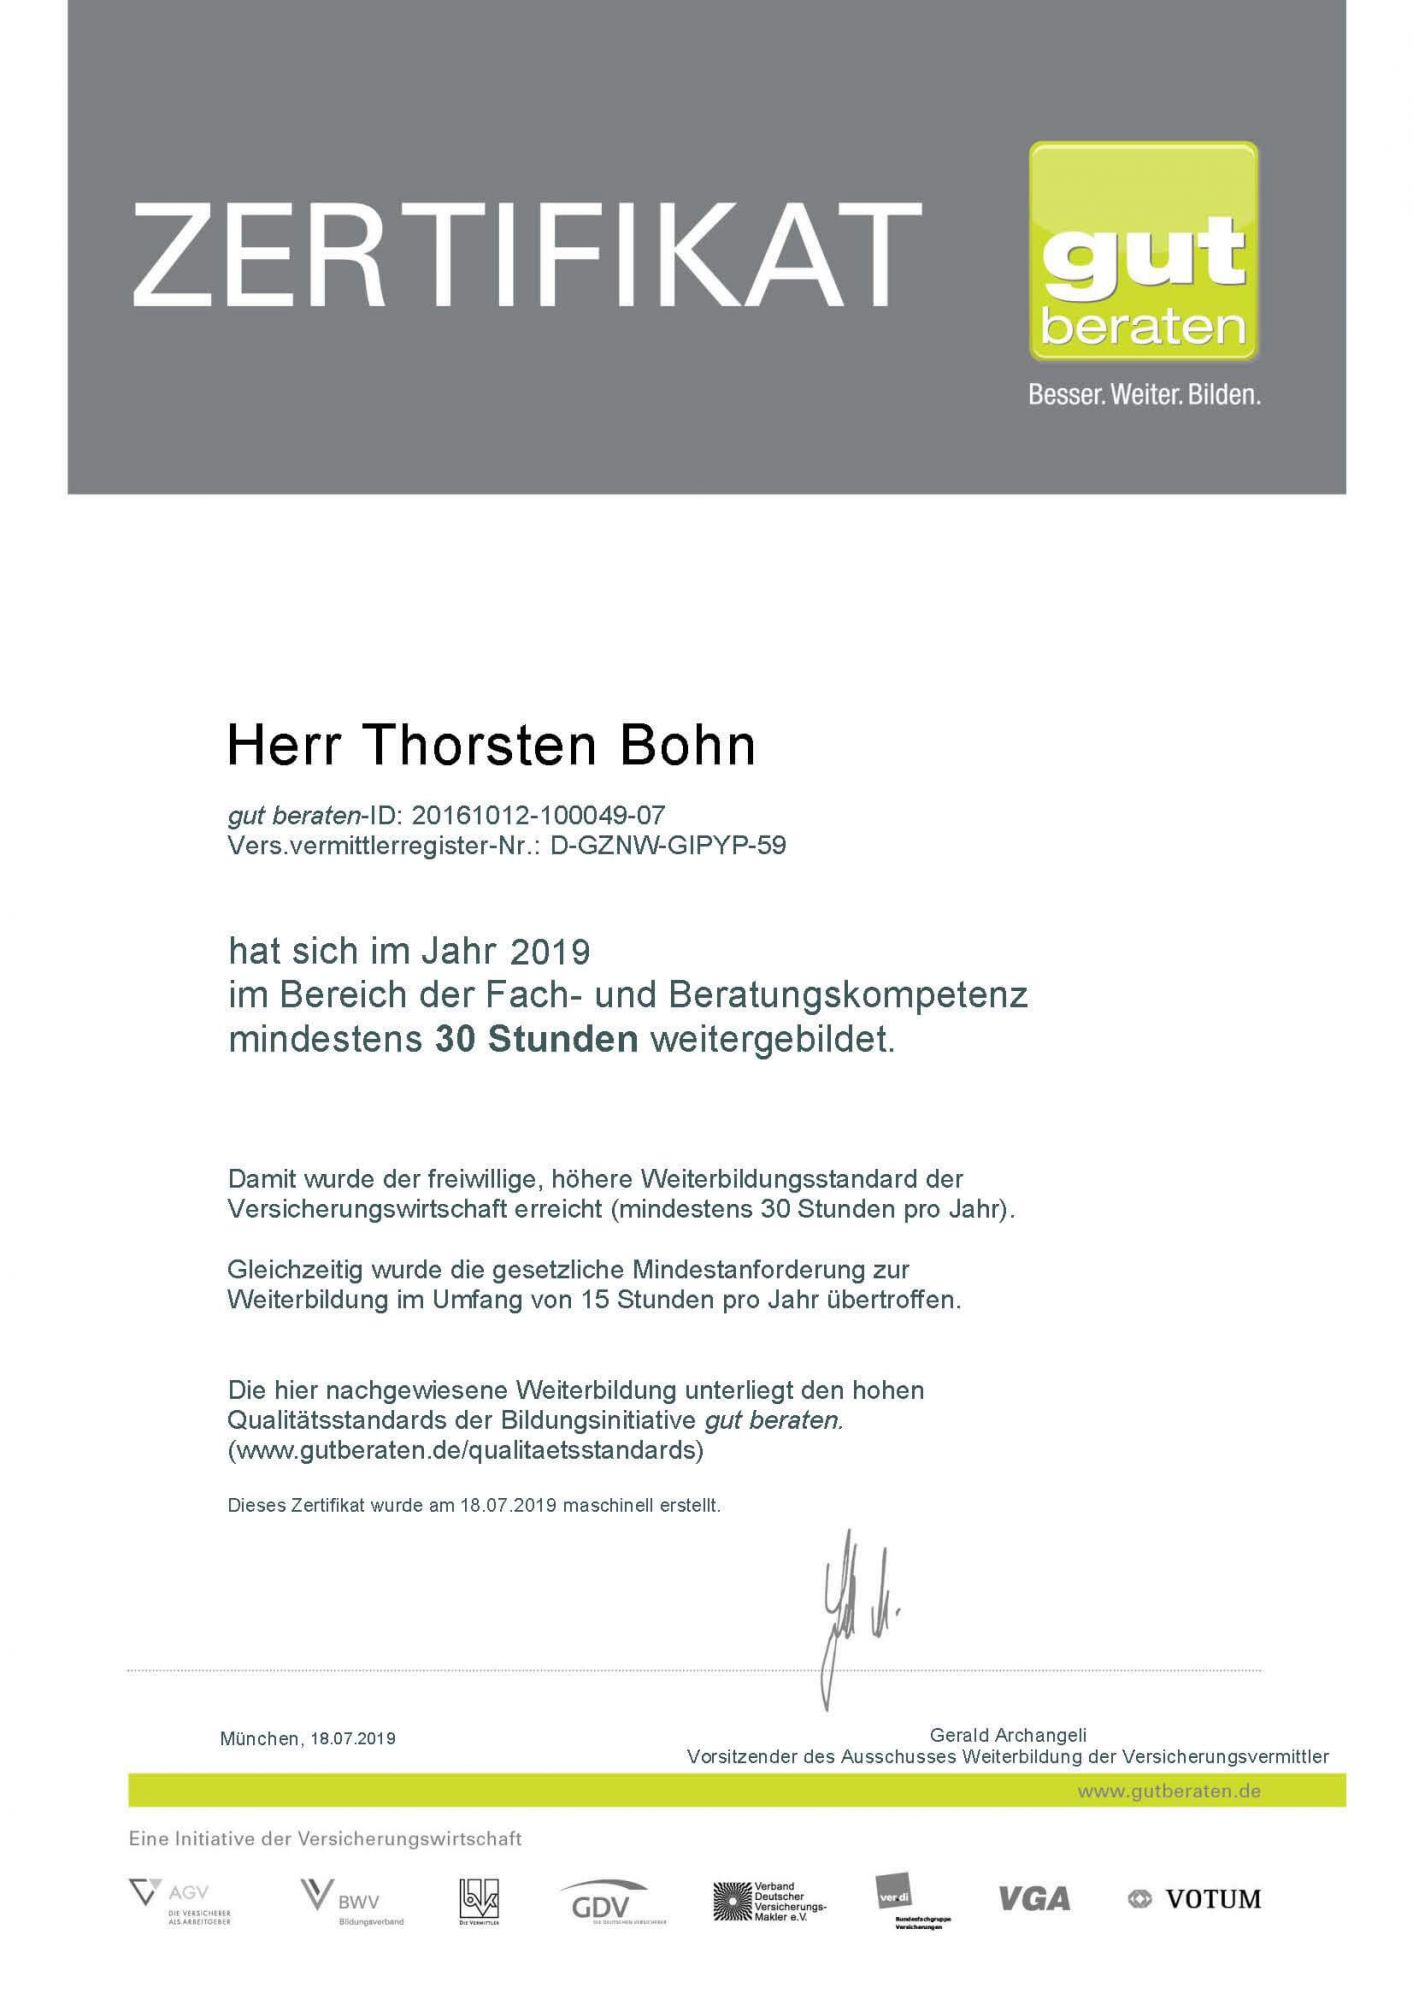 Zertifikat gut beraten 2019